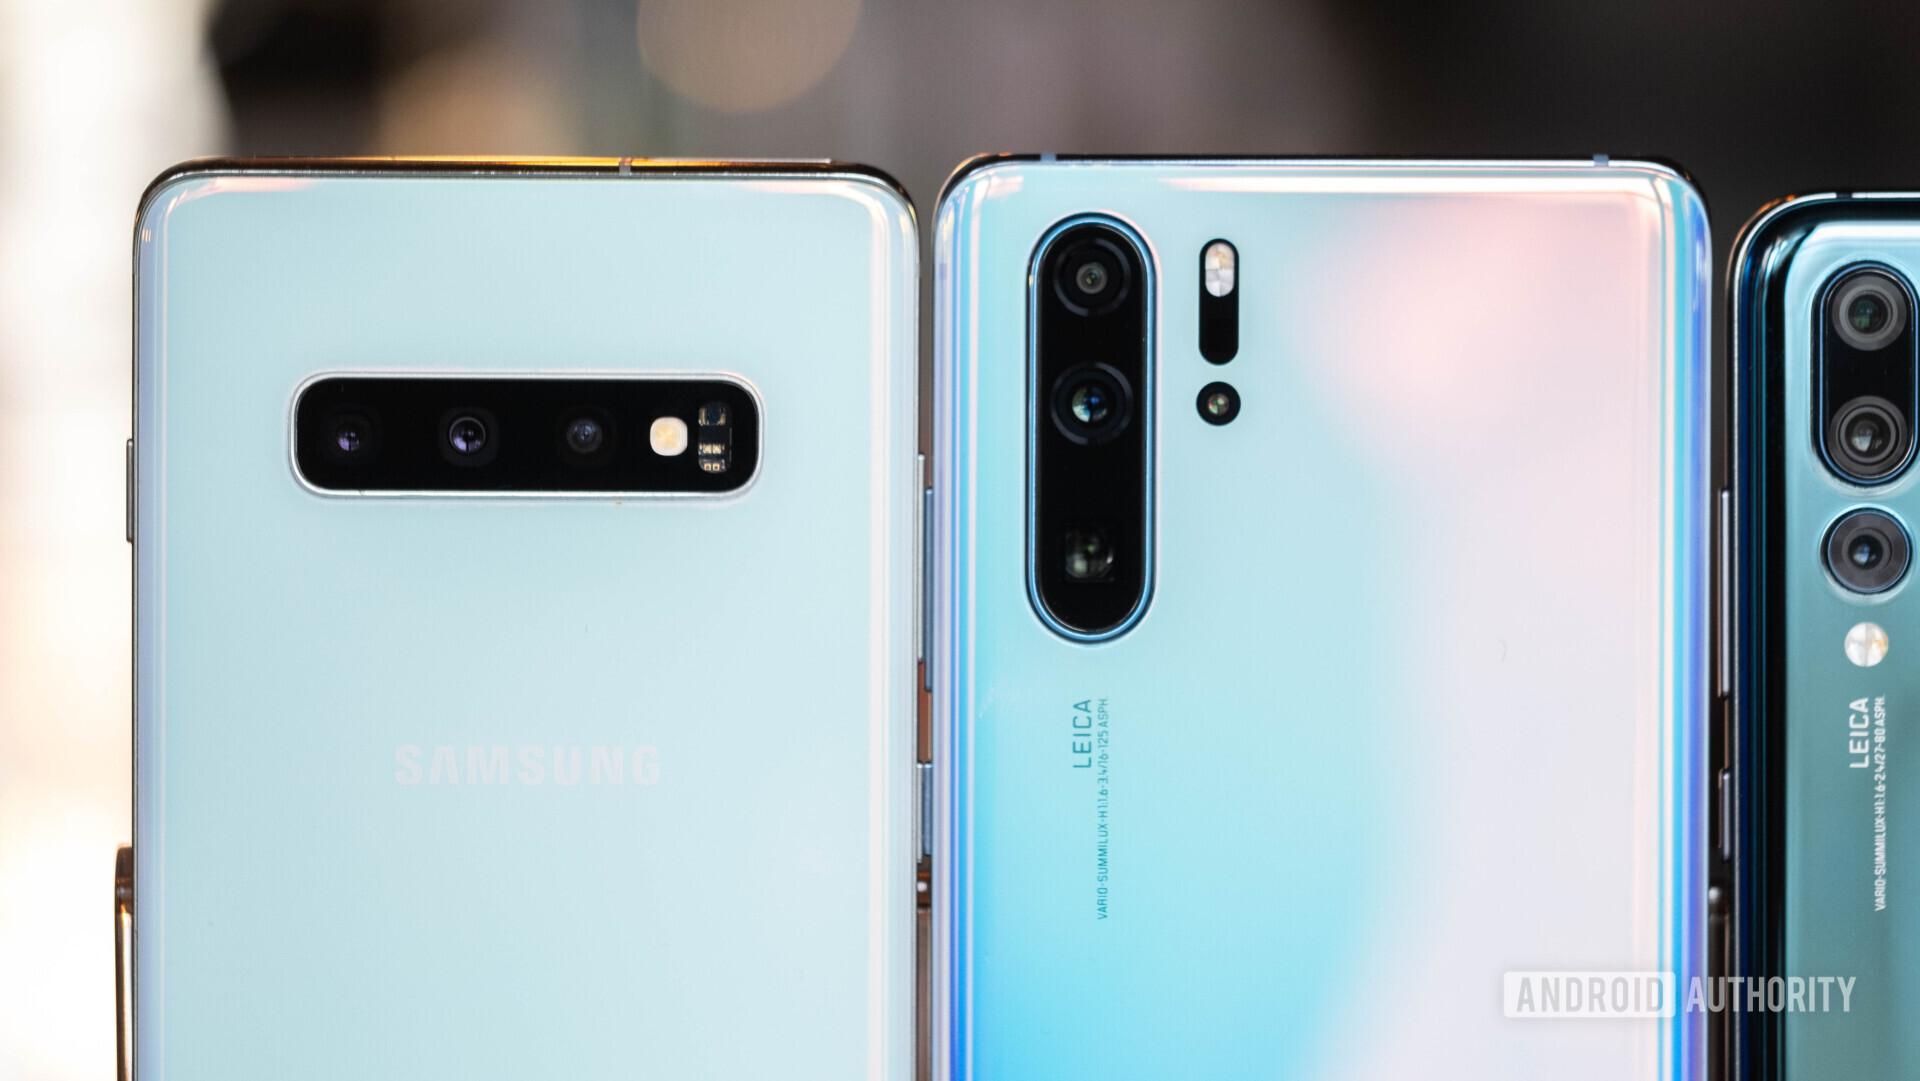 Huawei P30 Pro vs Samsung Galaxy S10 Plus cameras